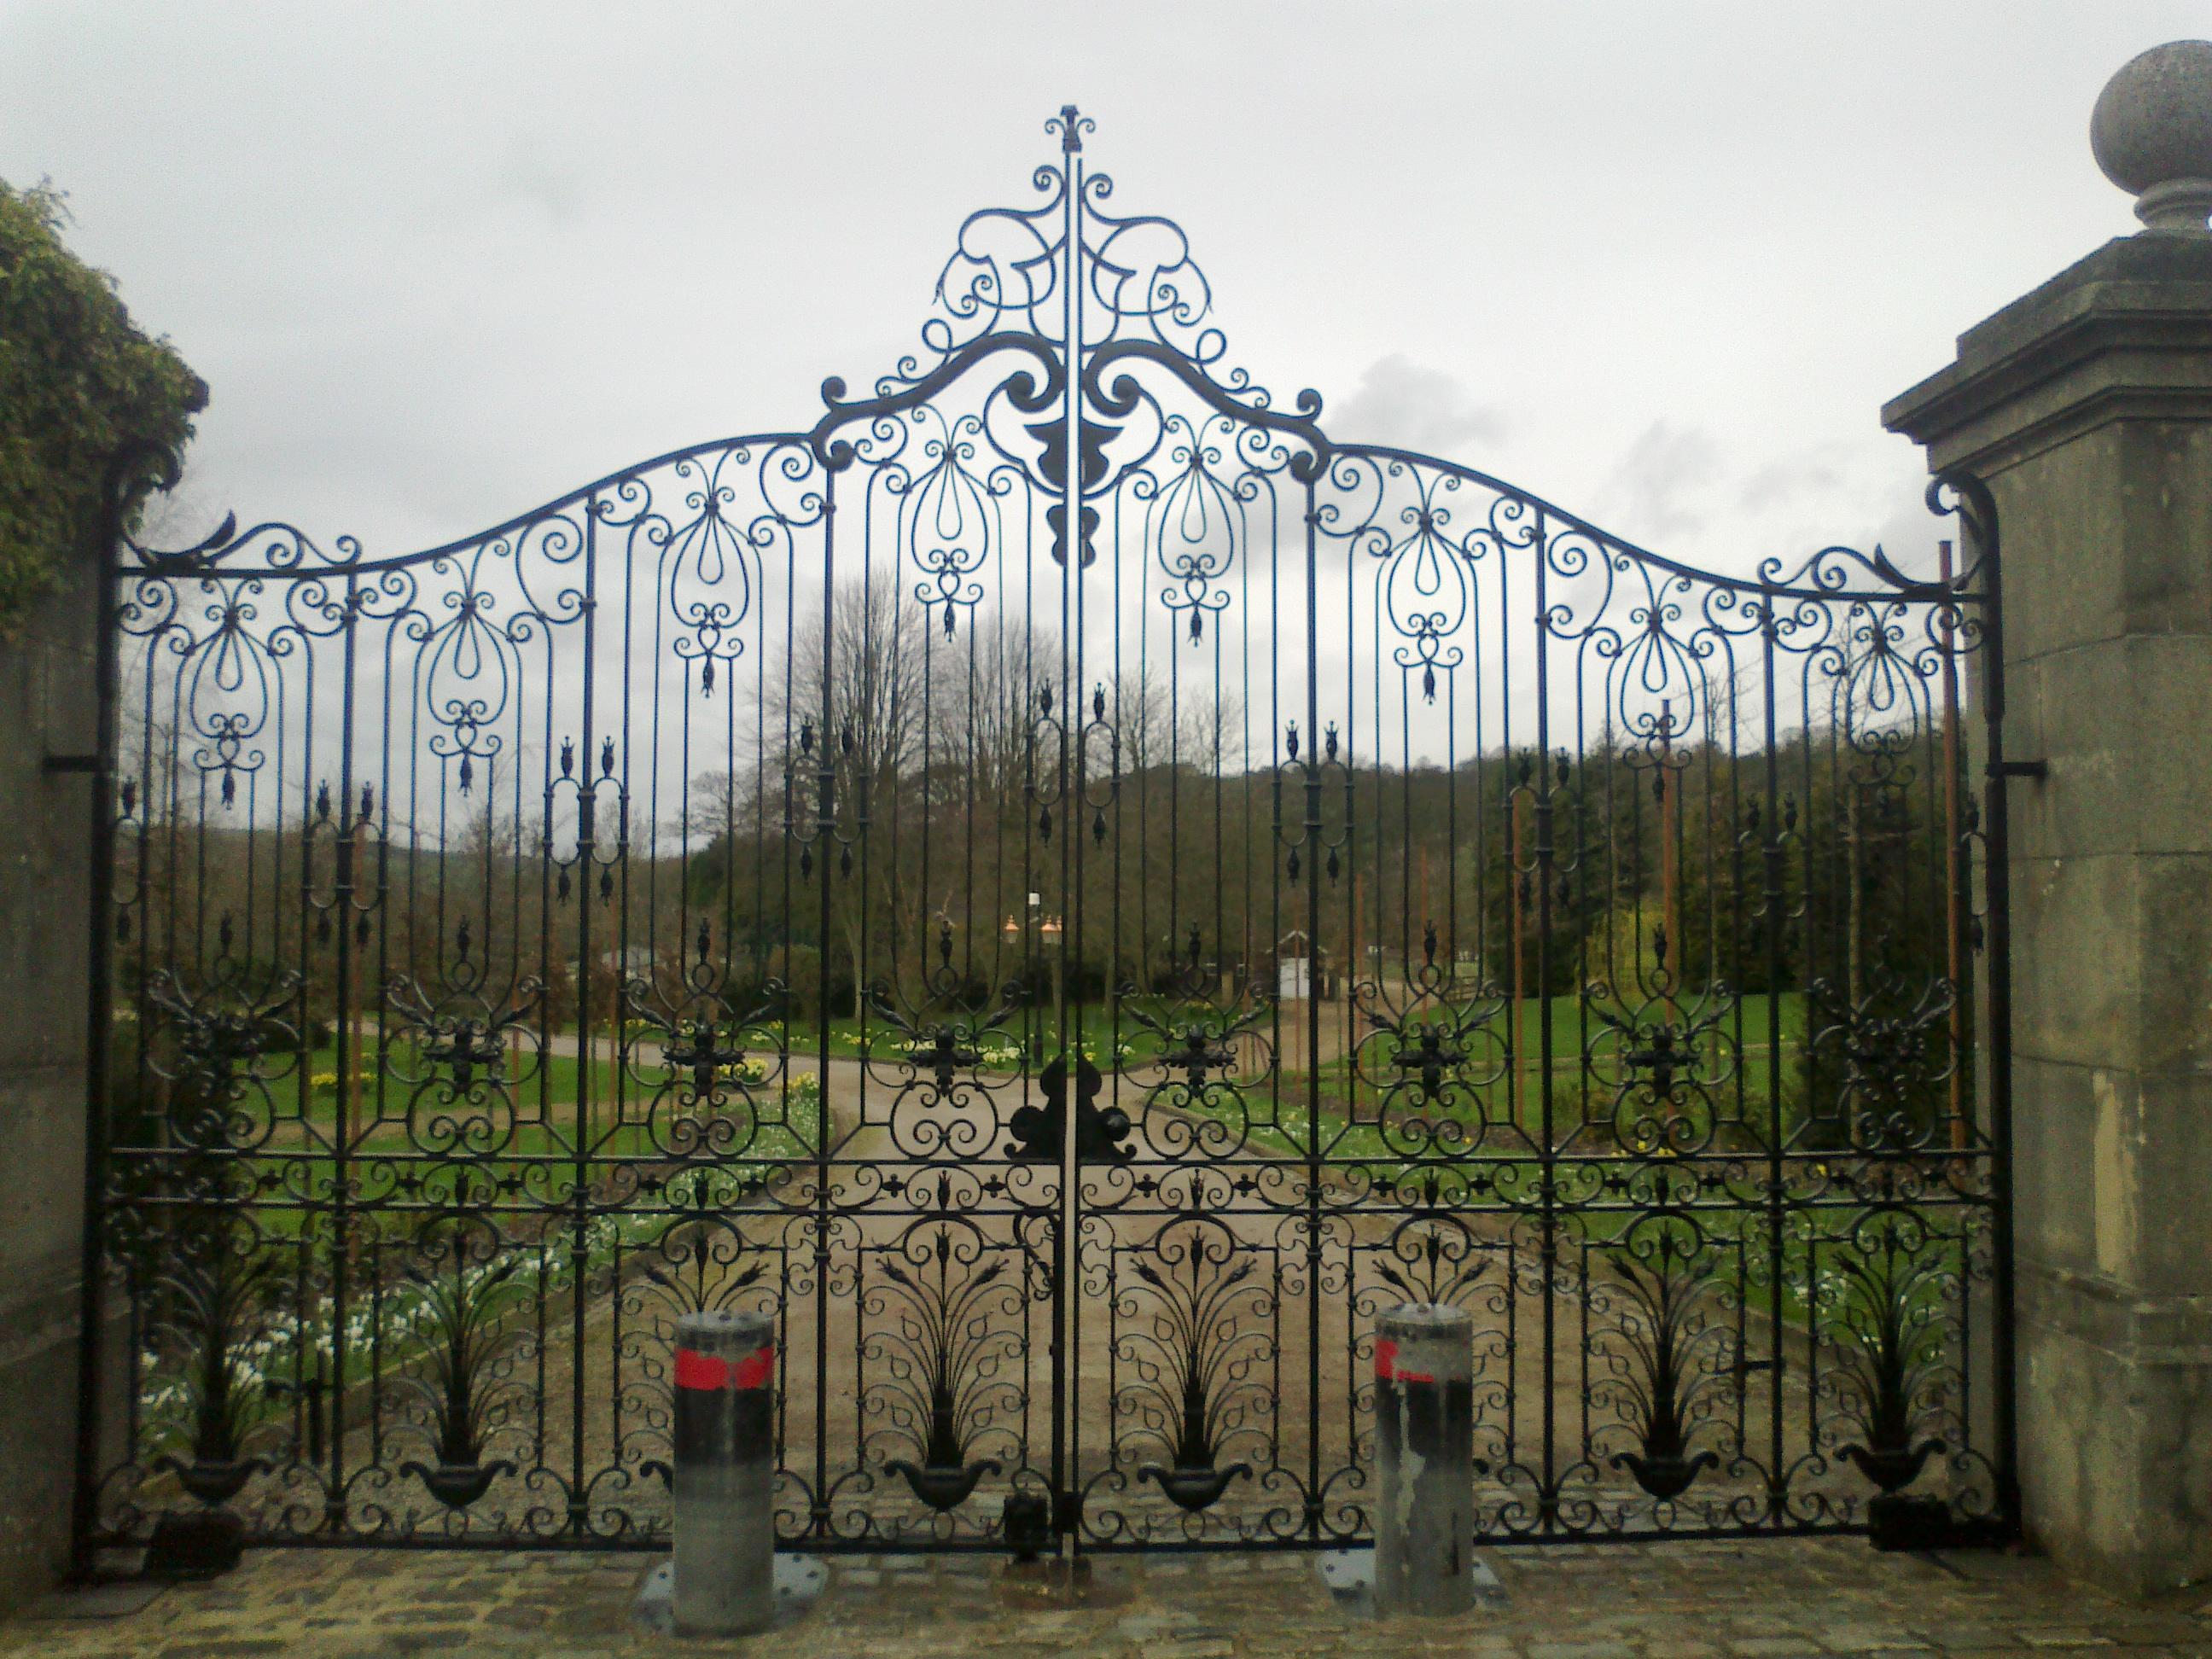 Wrought iron Entrance gates